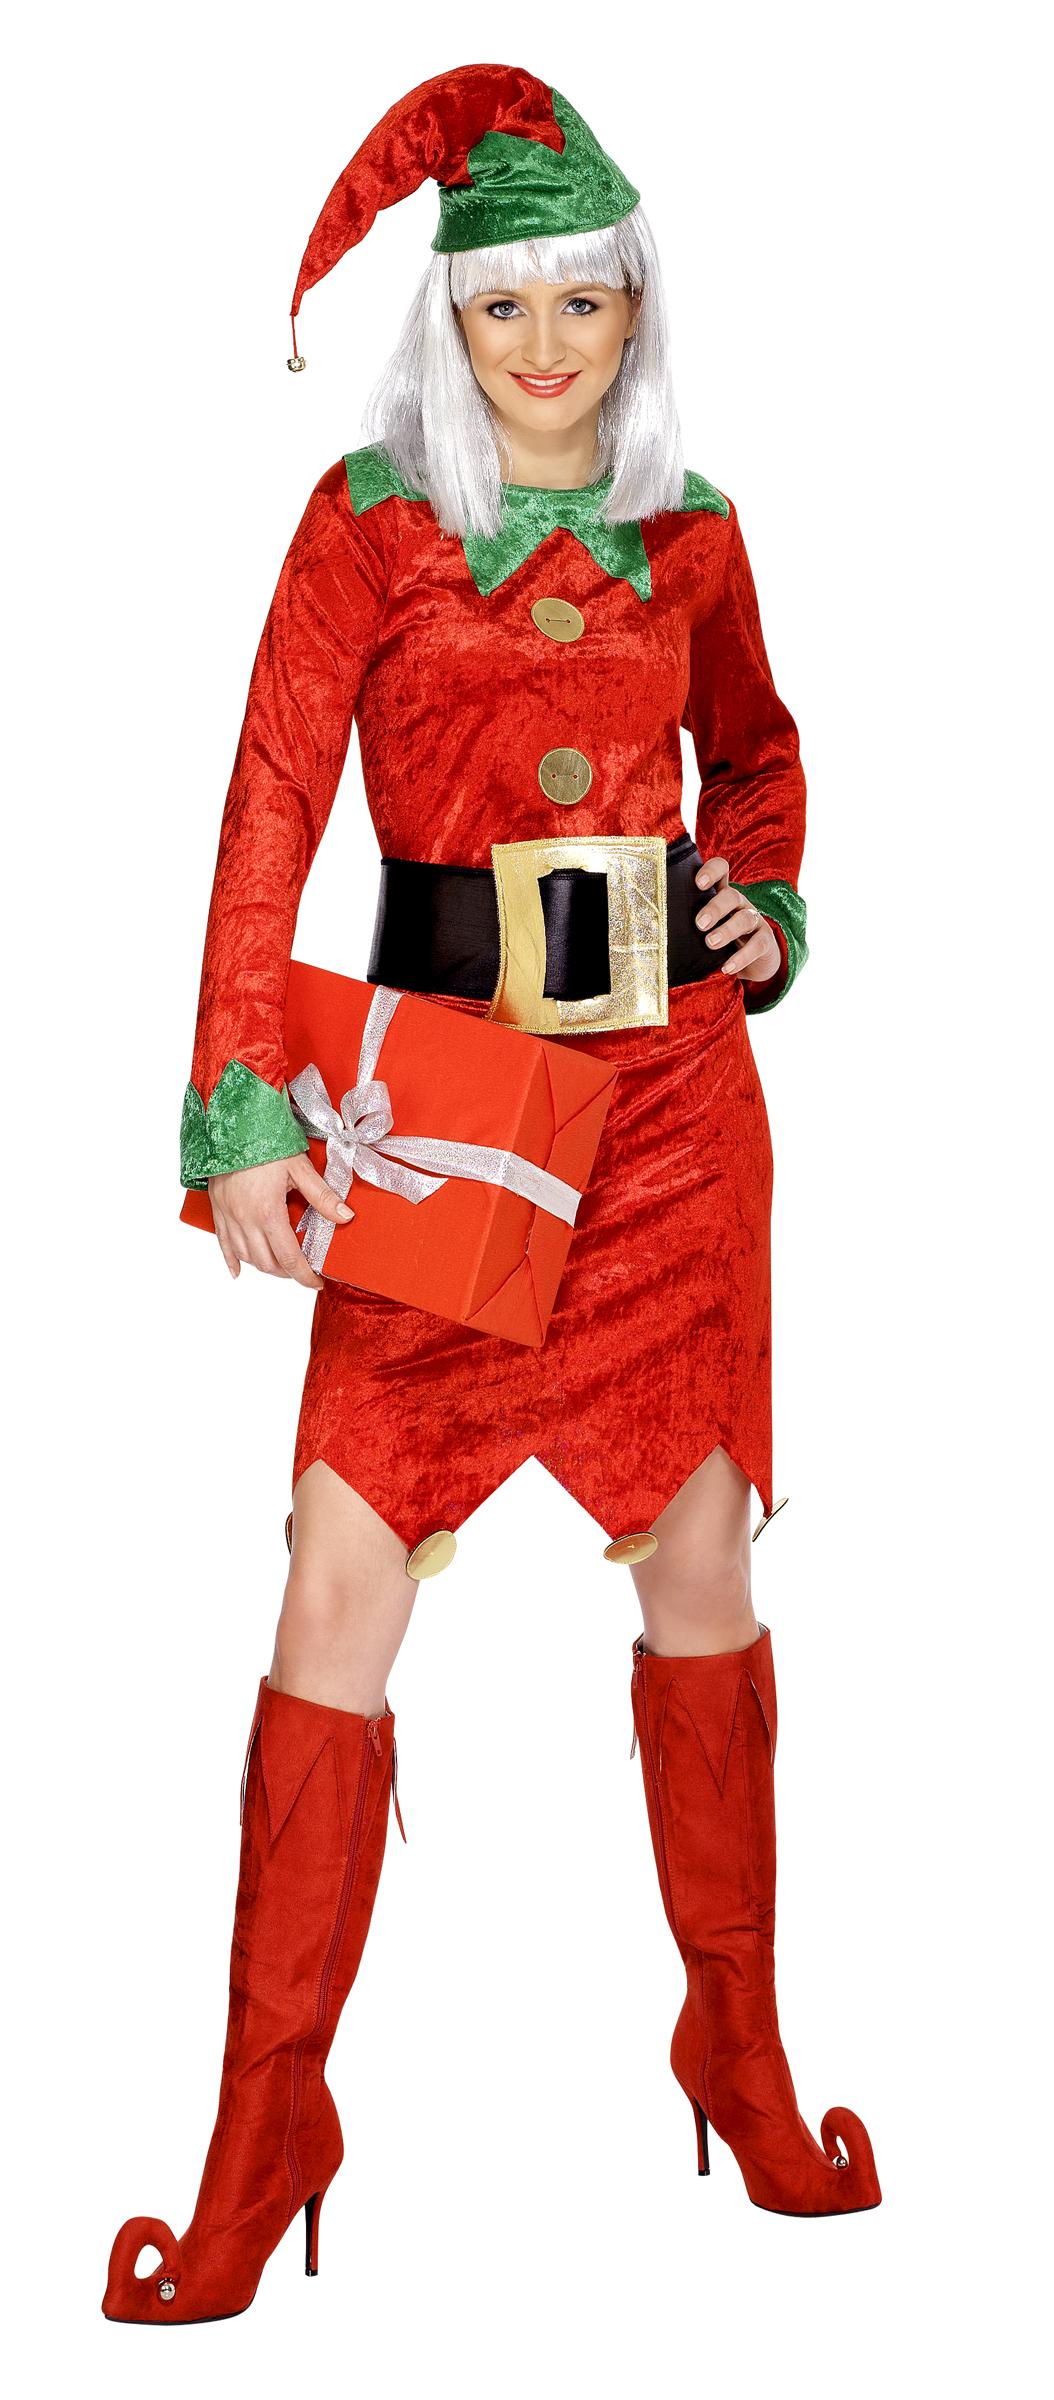 da7d87ddb81 Déguisement elfe femme Noël   Deguise-toi